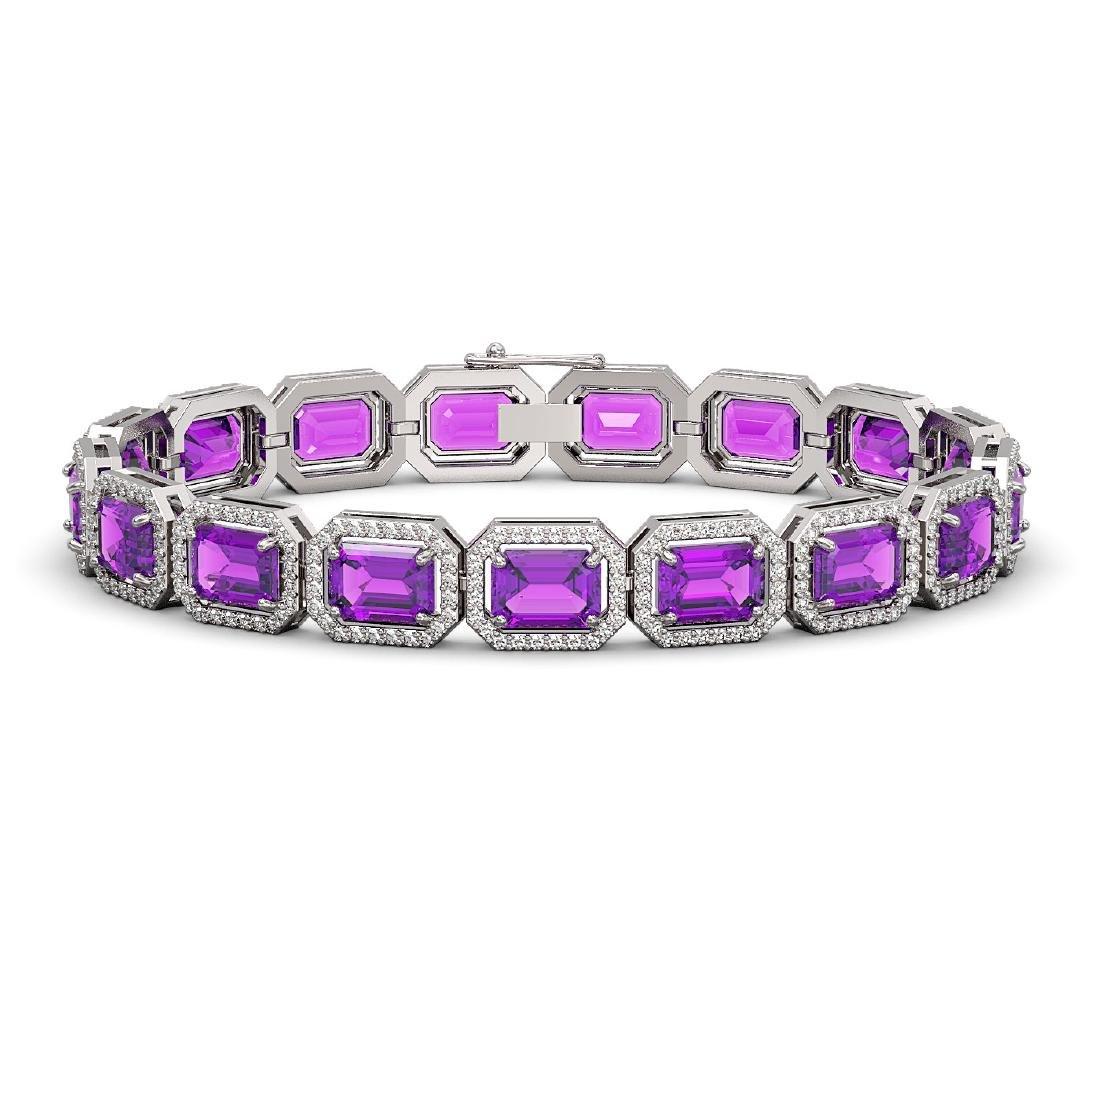 22.81 CTW Amethyst & Diamond Halo Bracelet 10K White